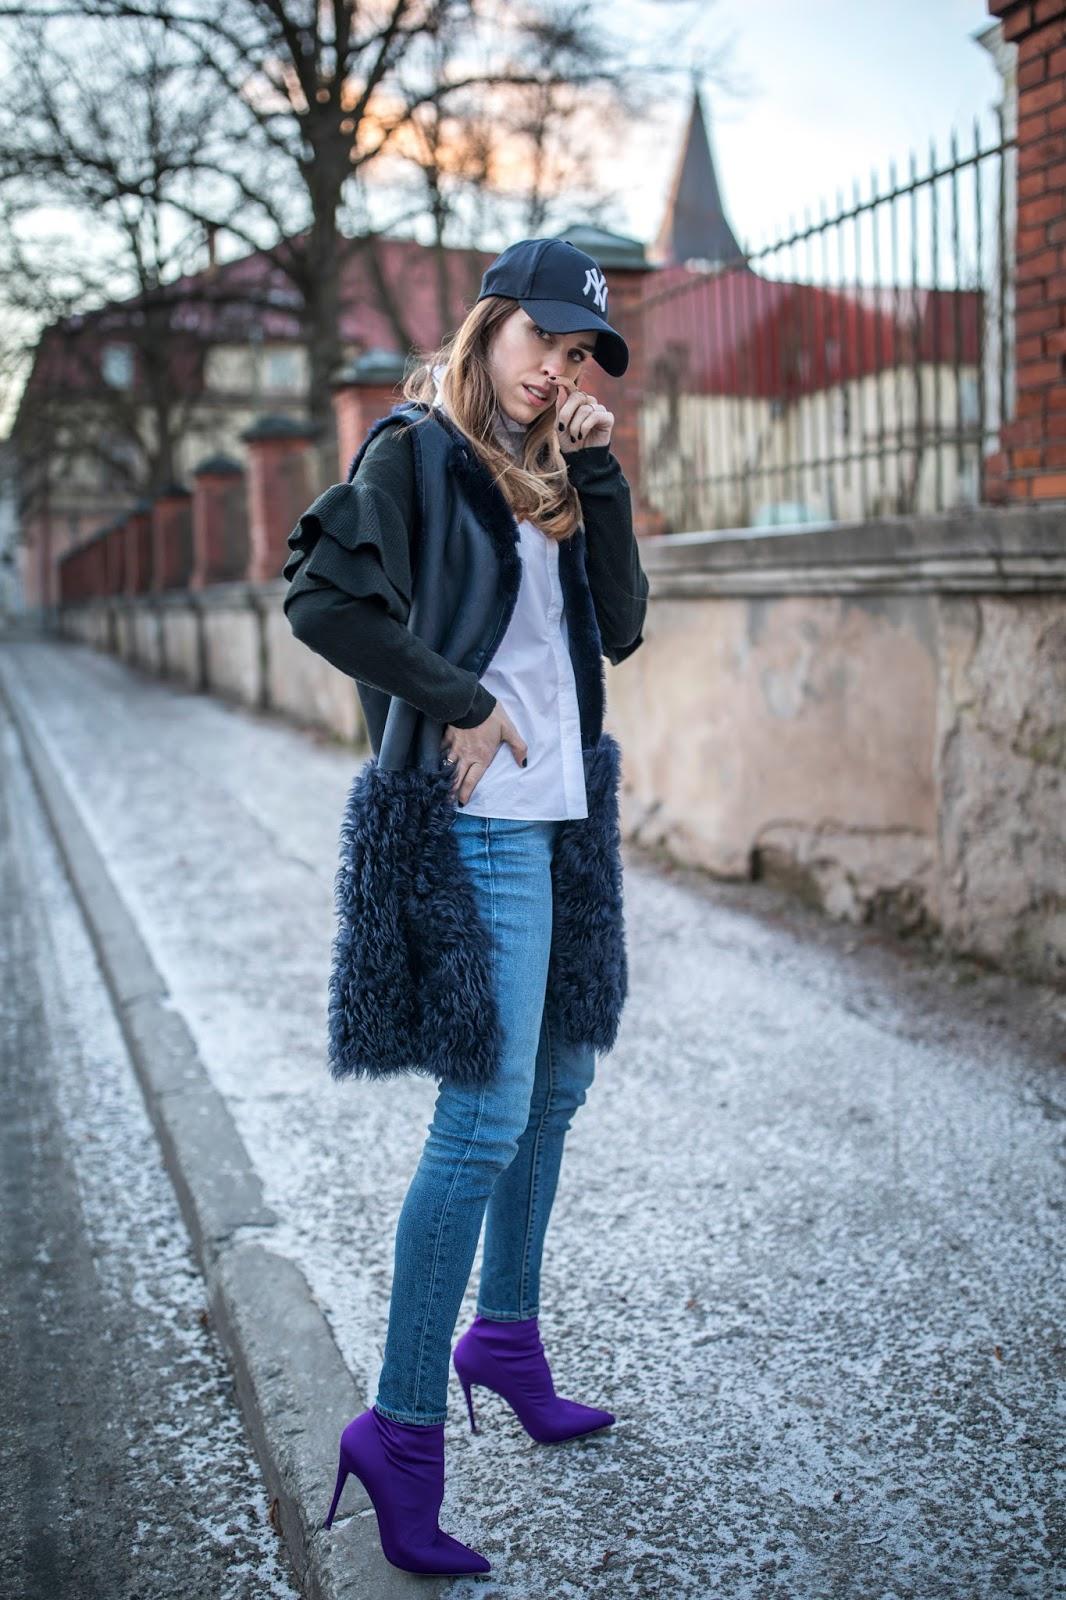 cap heels winter outfit